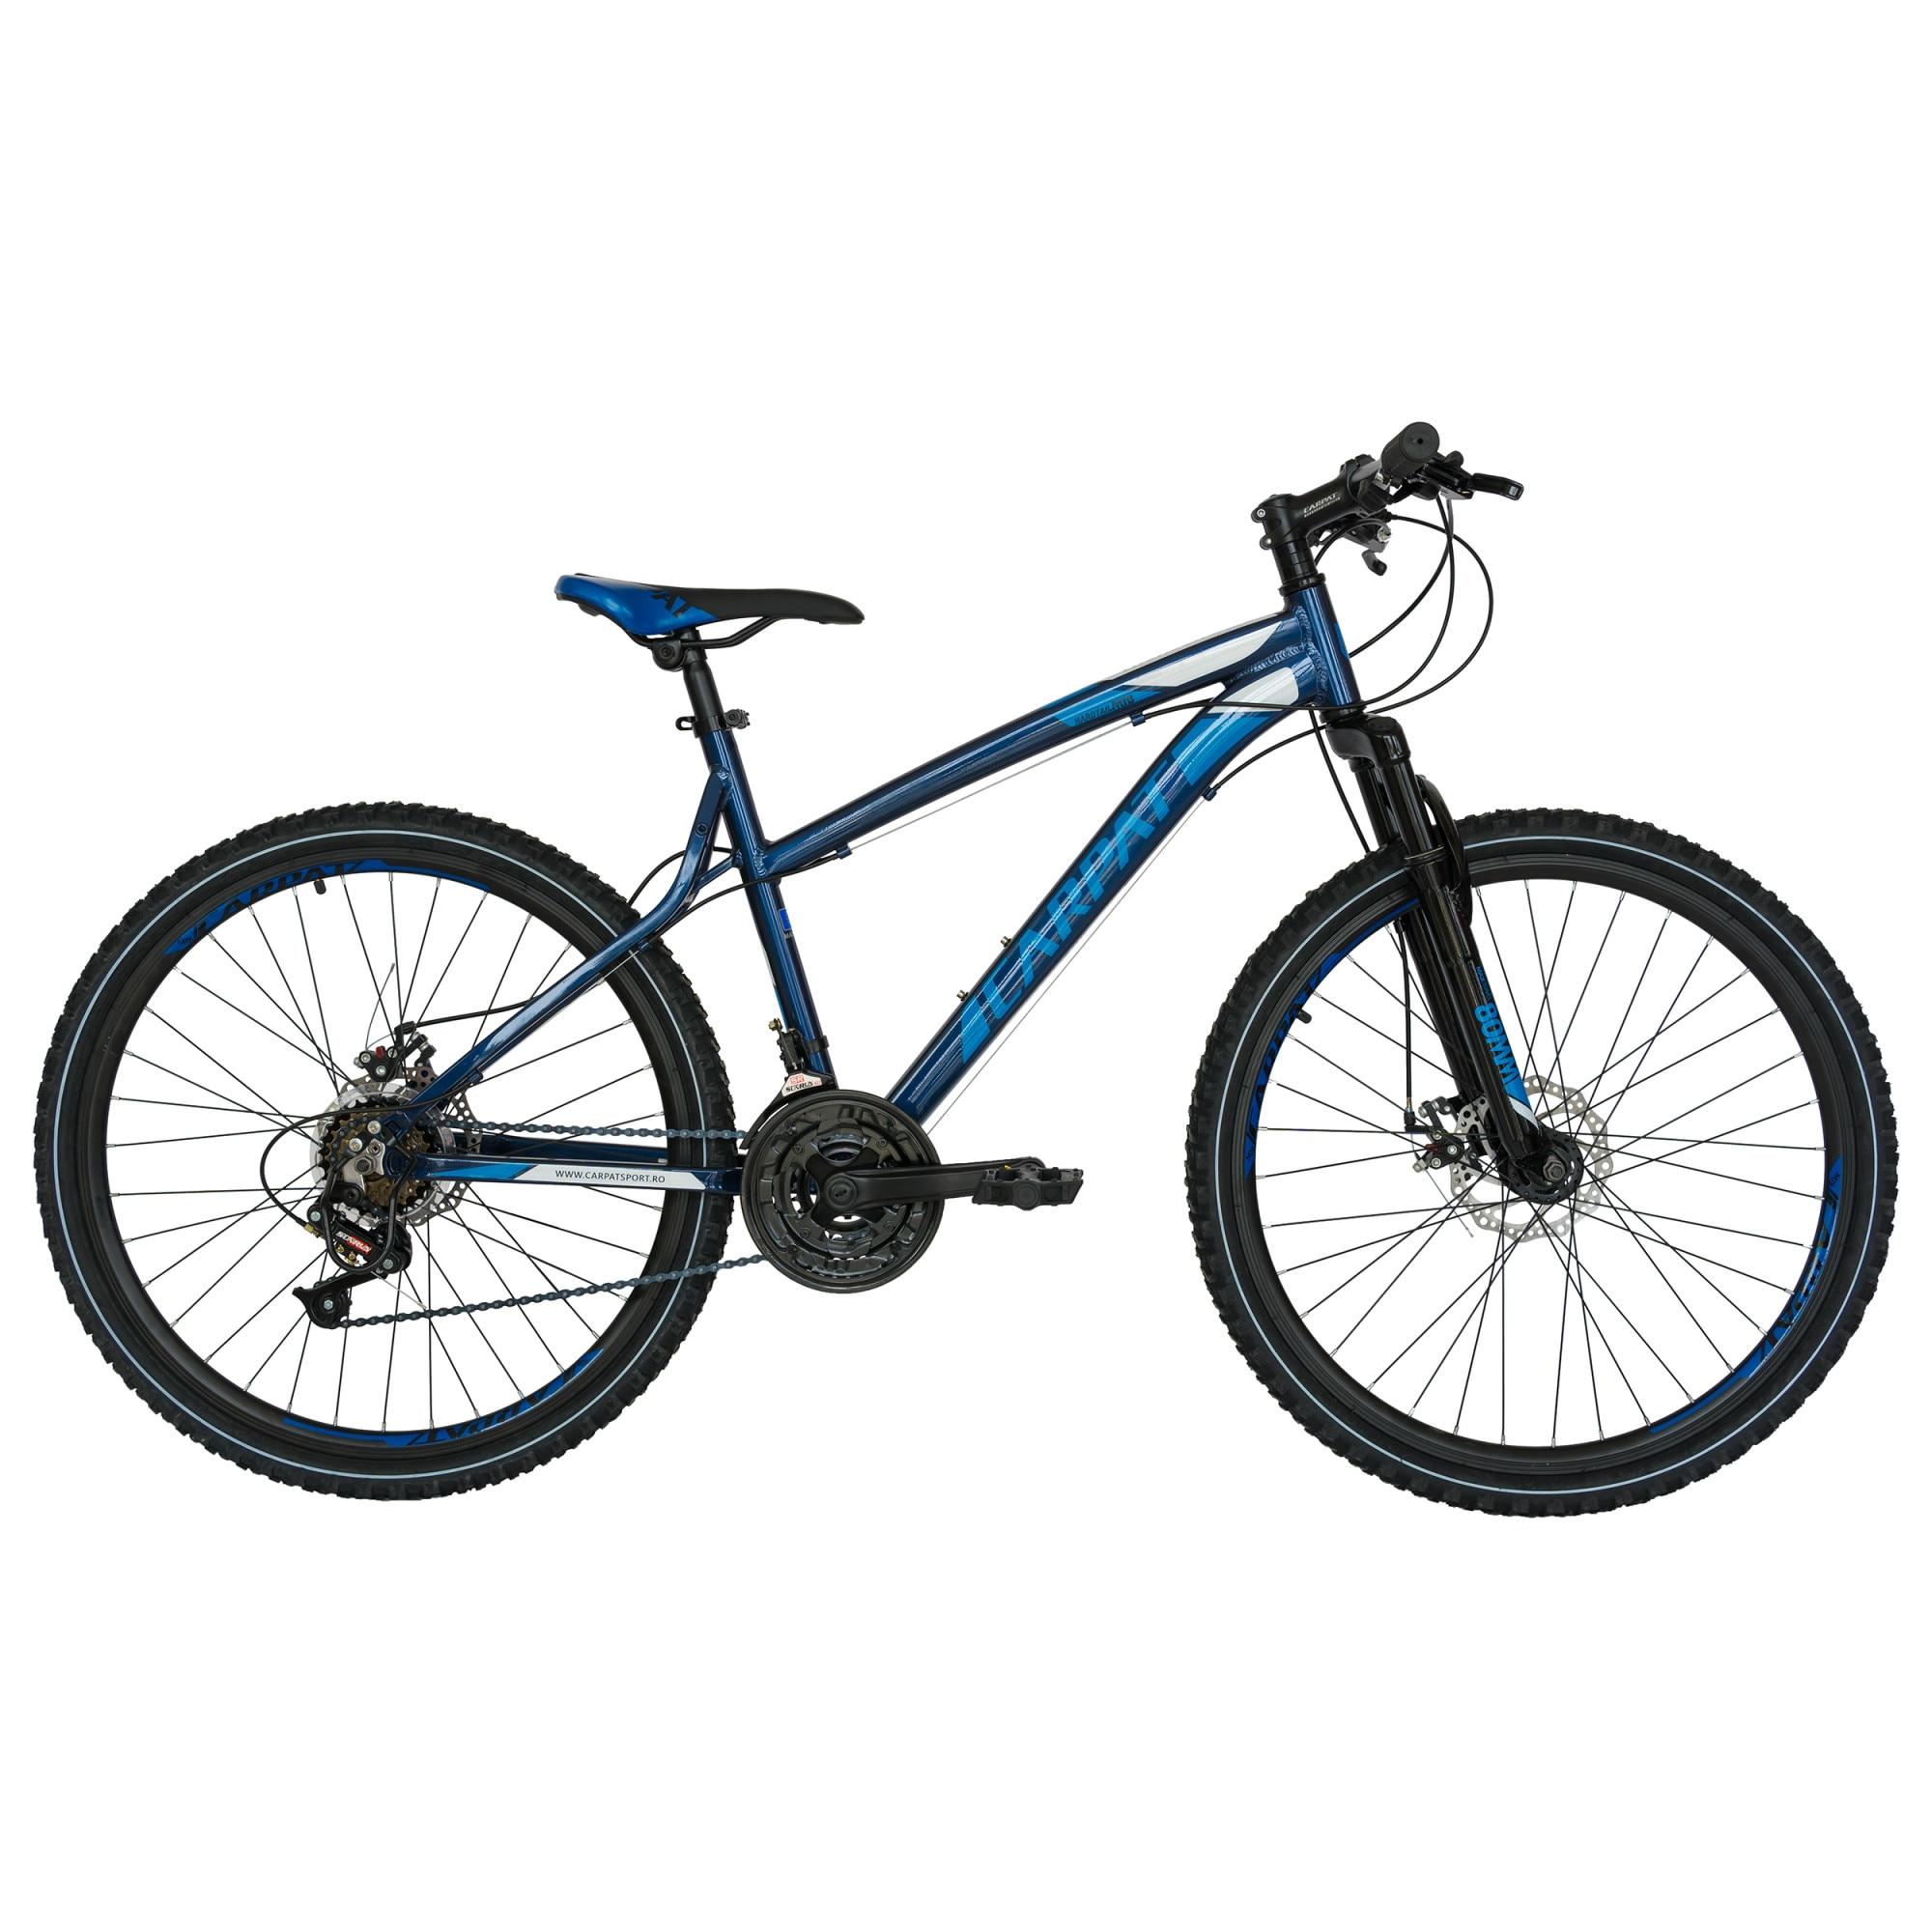 "Fotografie Bicicleta Carpat MTB AL 26"" Disc C2654A, Gri/Albastru"